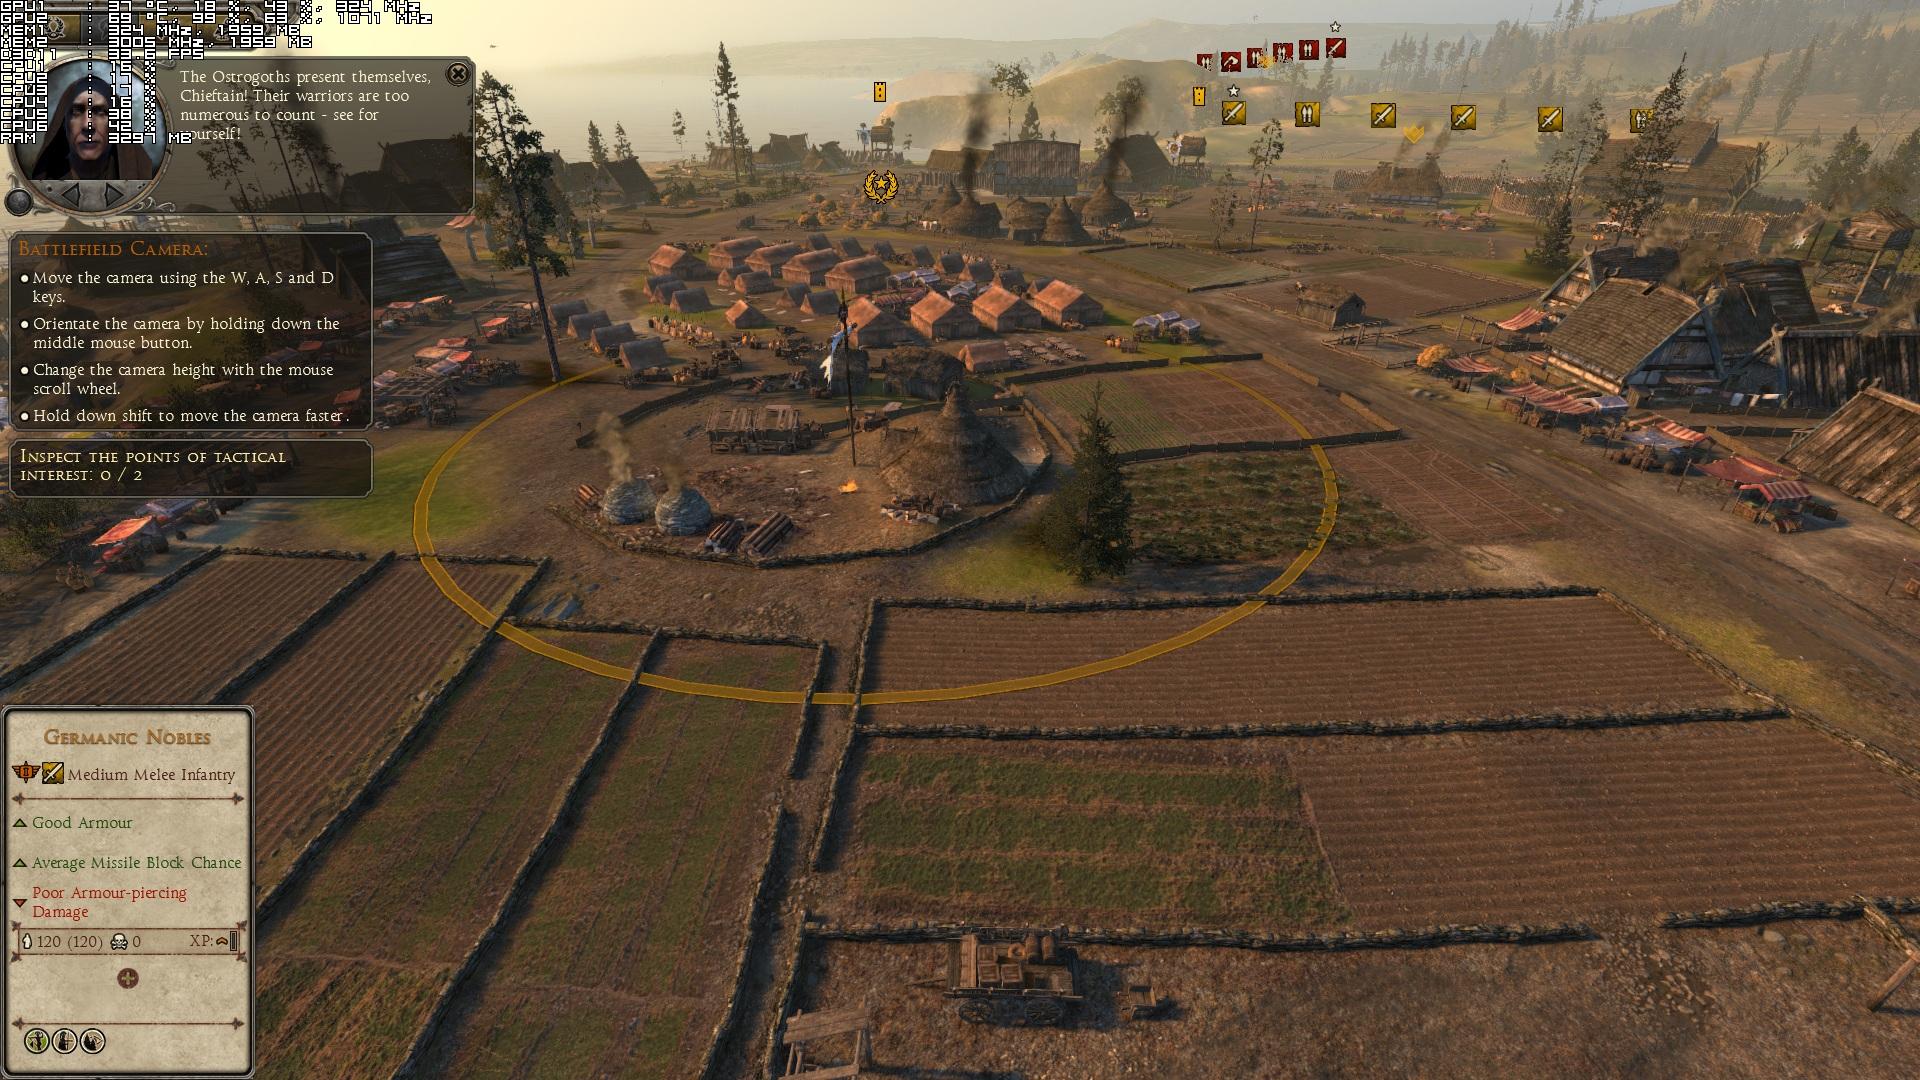 Total War: ATTILA - PC Performance Analysis - DSOGaming